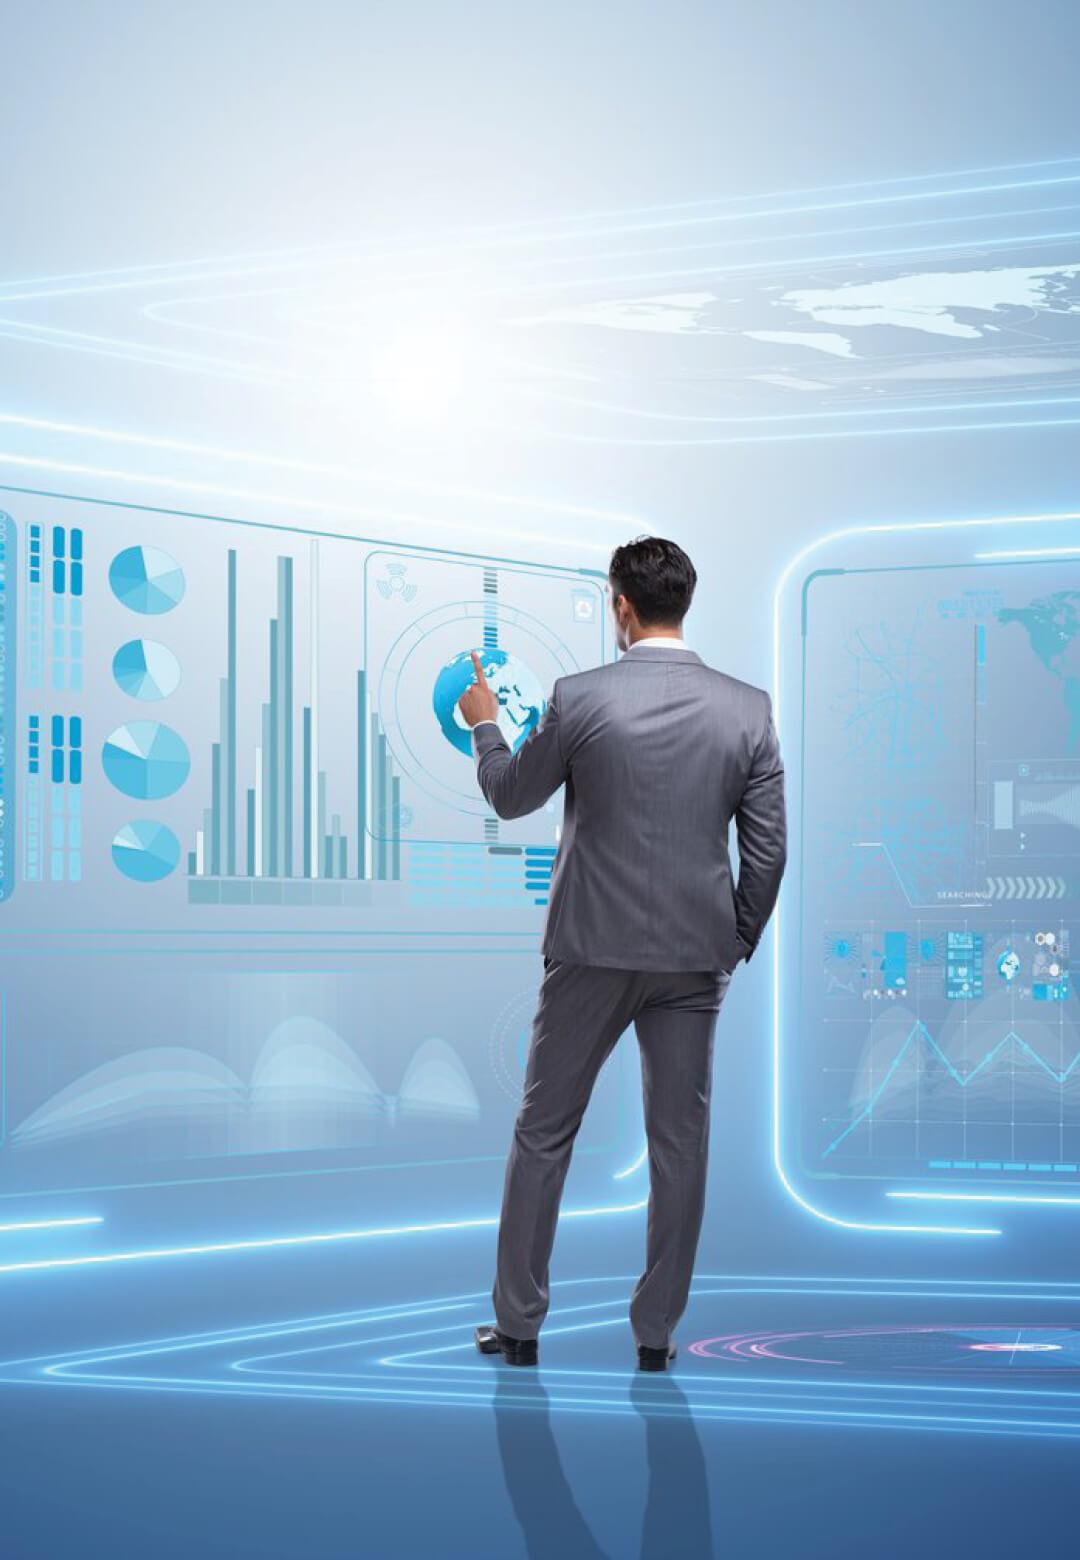 Digital Business | Digital Legacies: Zoom (macro to micro) | STIRworld